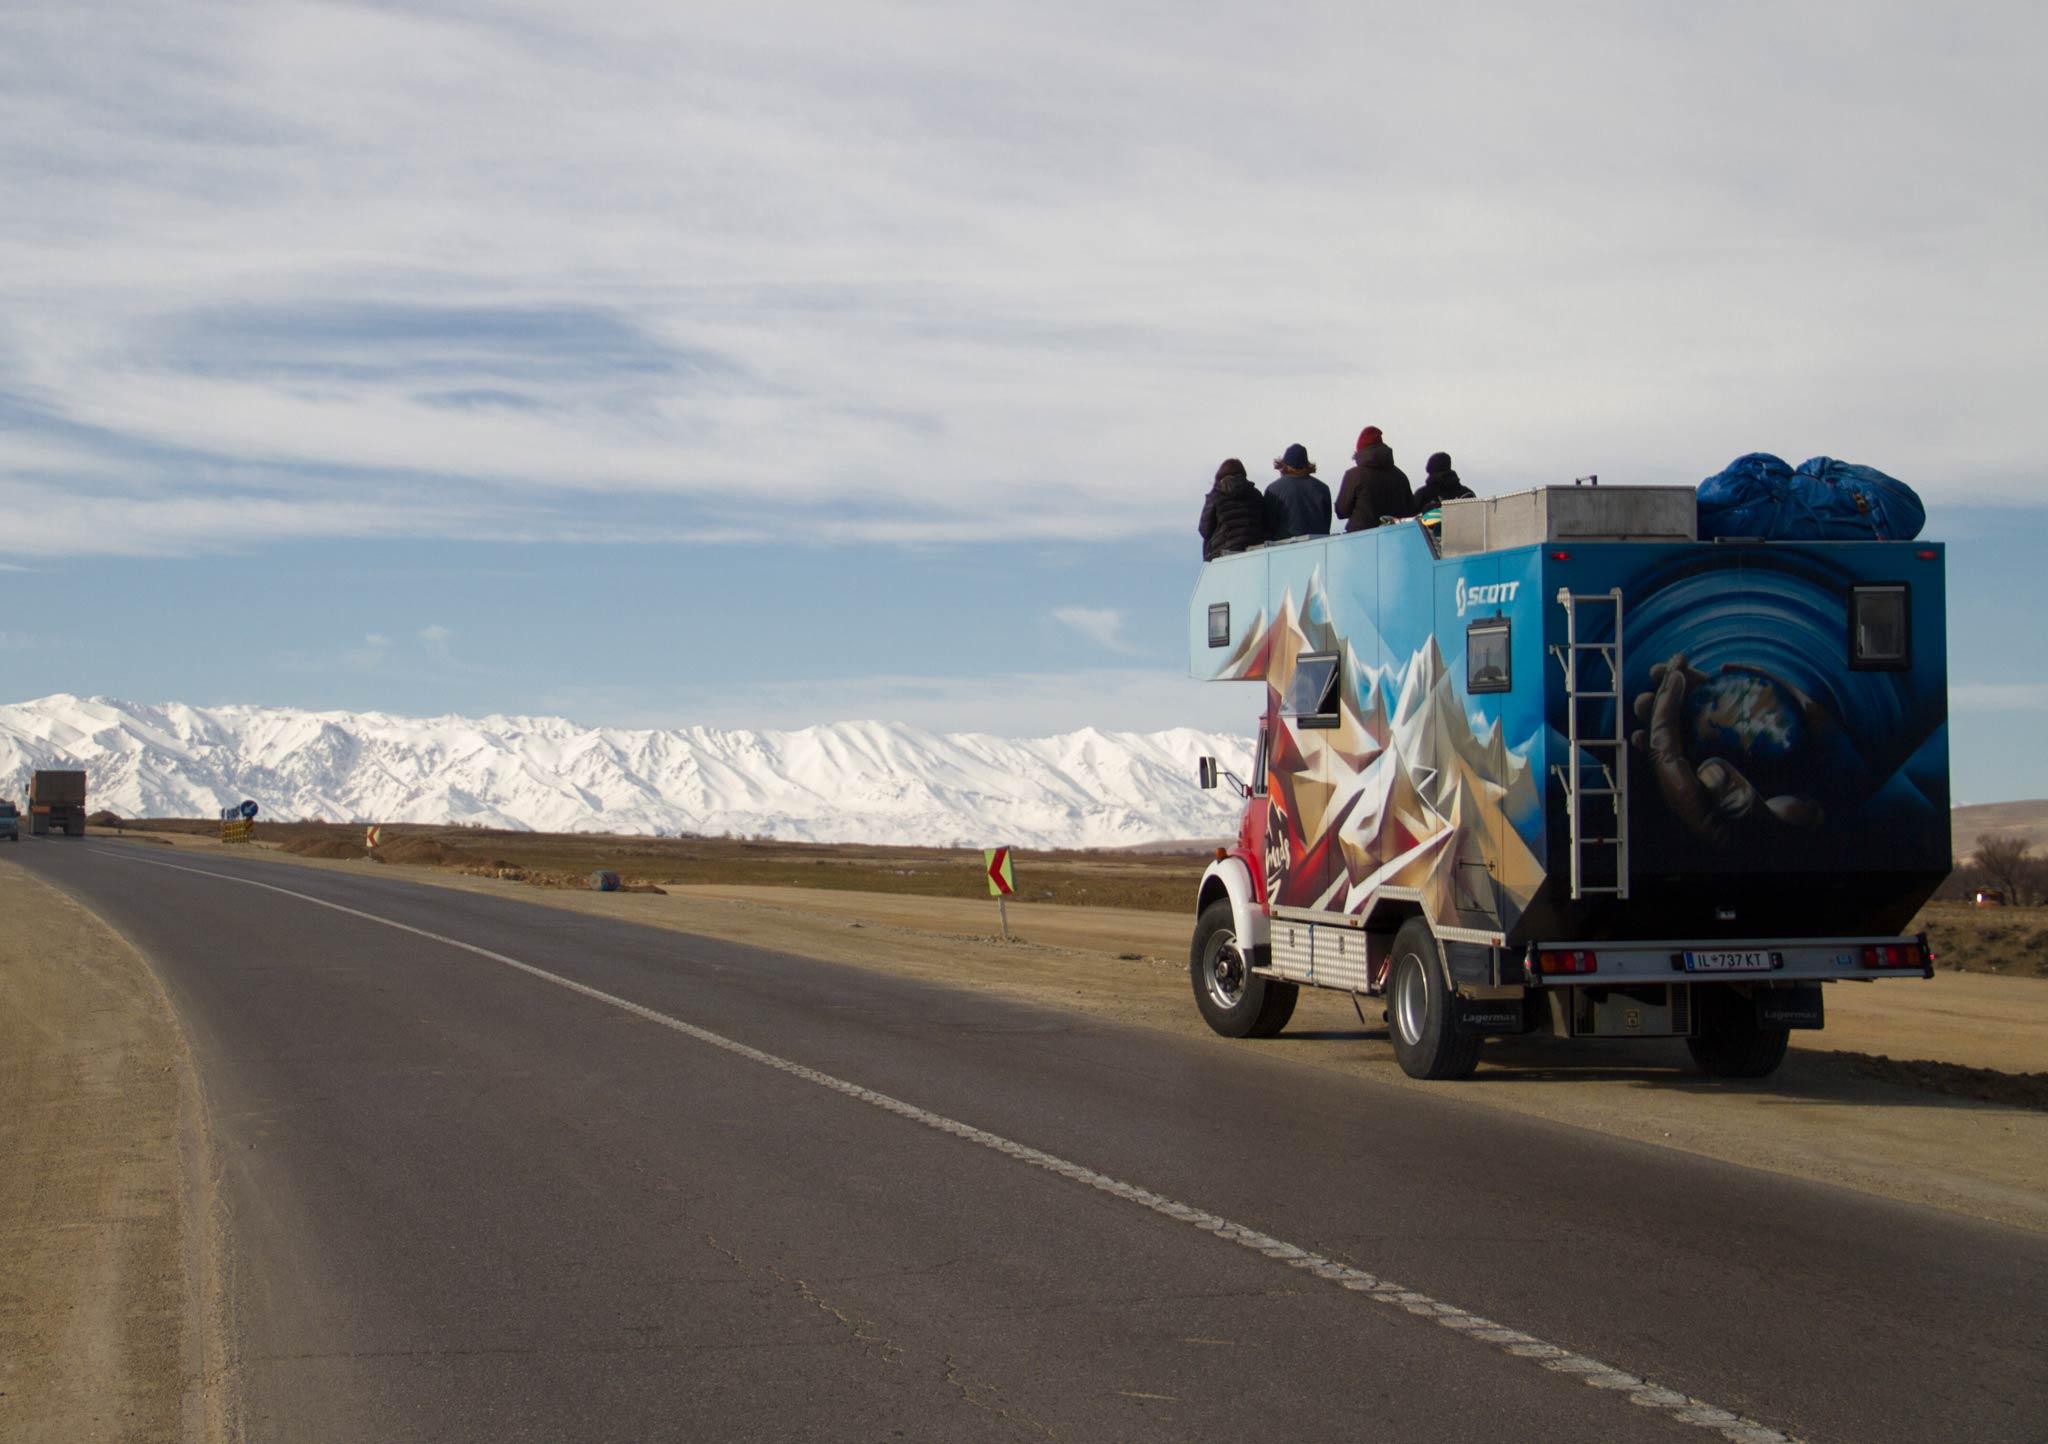 Location: Iran - Foto: Jochen Mesle